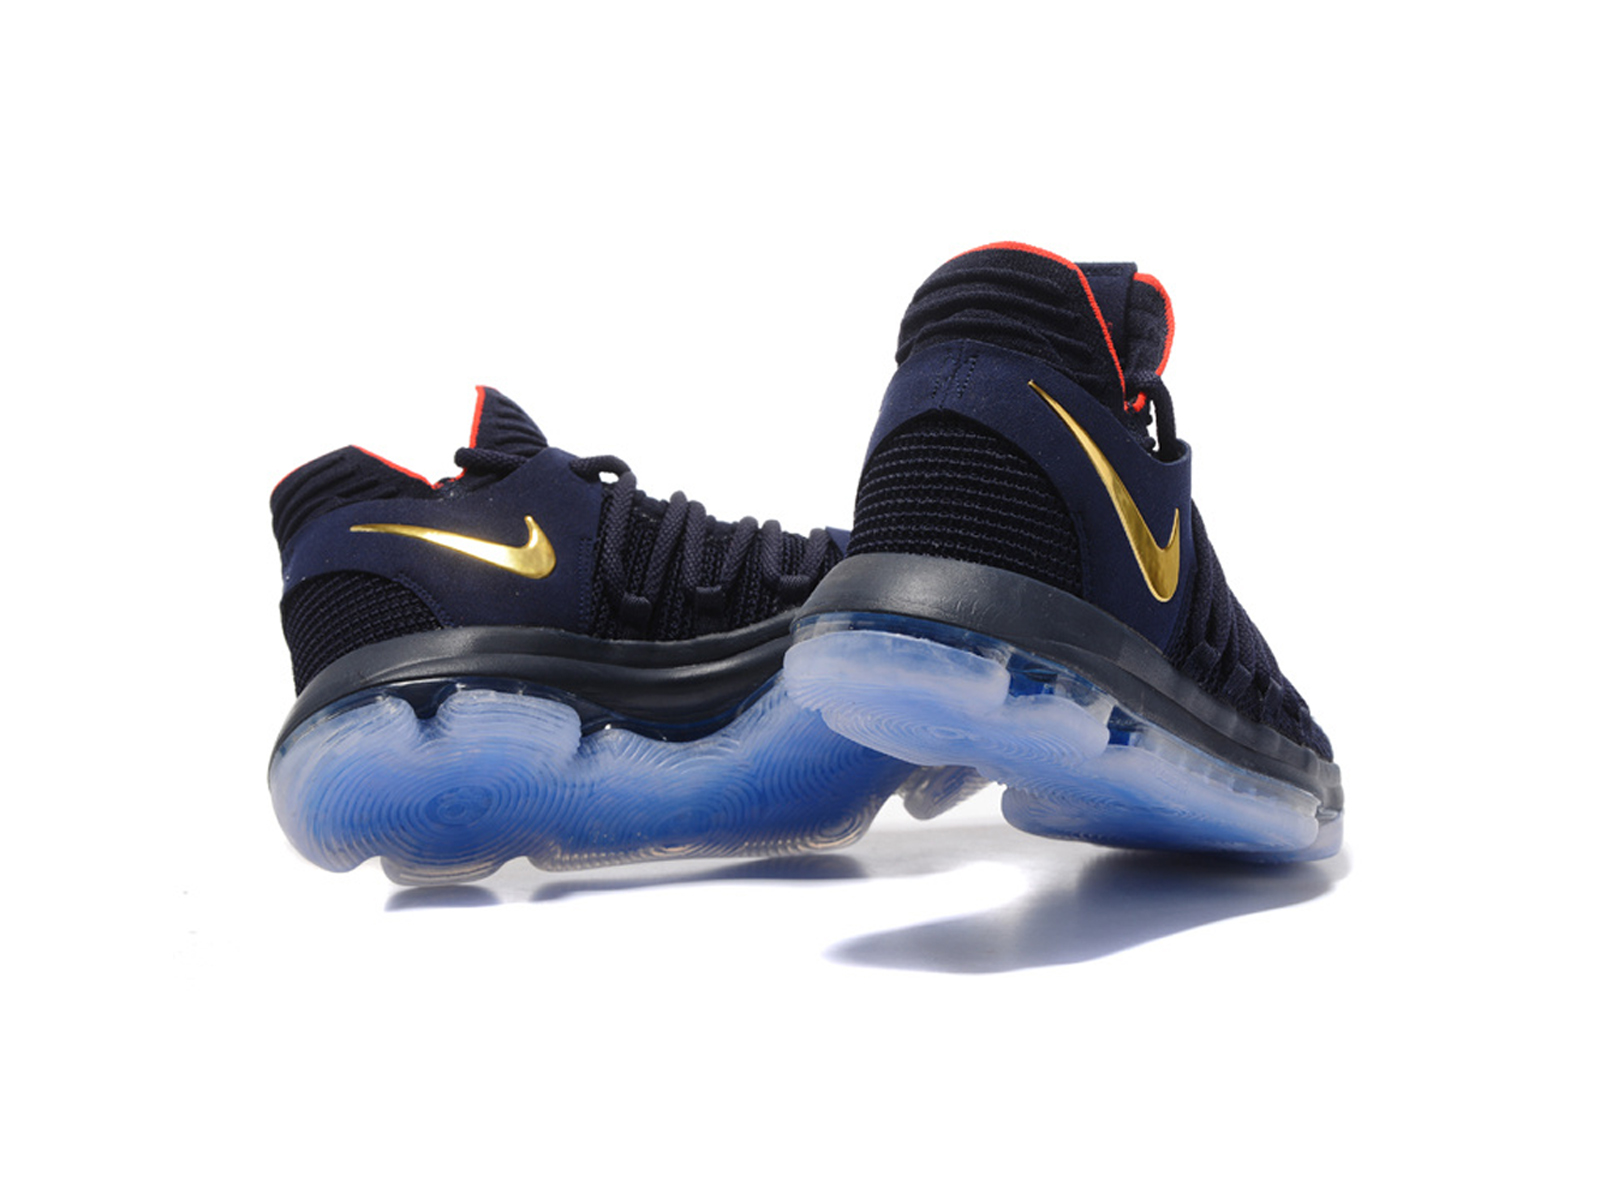 official photos 9a4ba 1bb5d Nike KD 10 Nike Kevin Durant 10 Navy Blue - магазин Степшоп